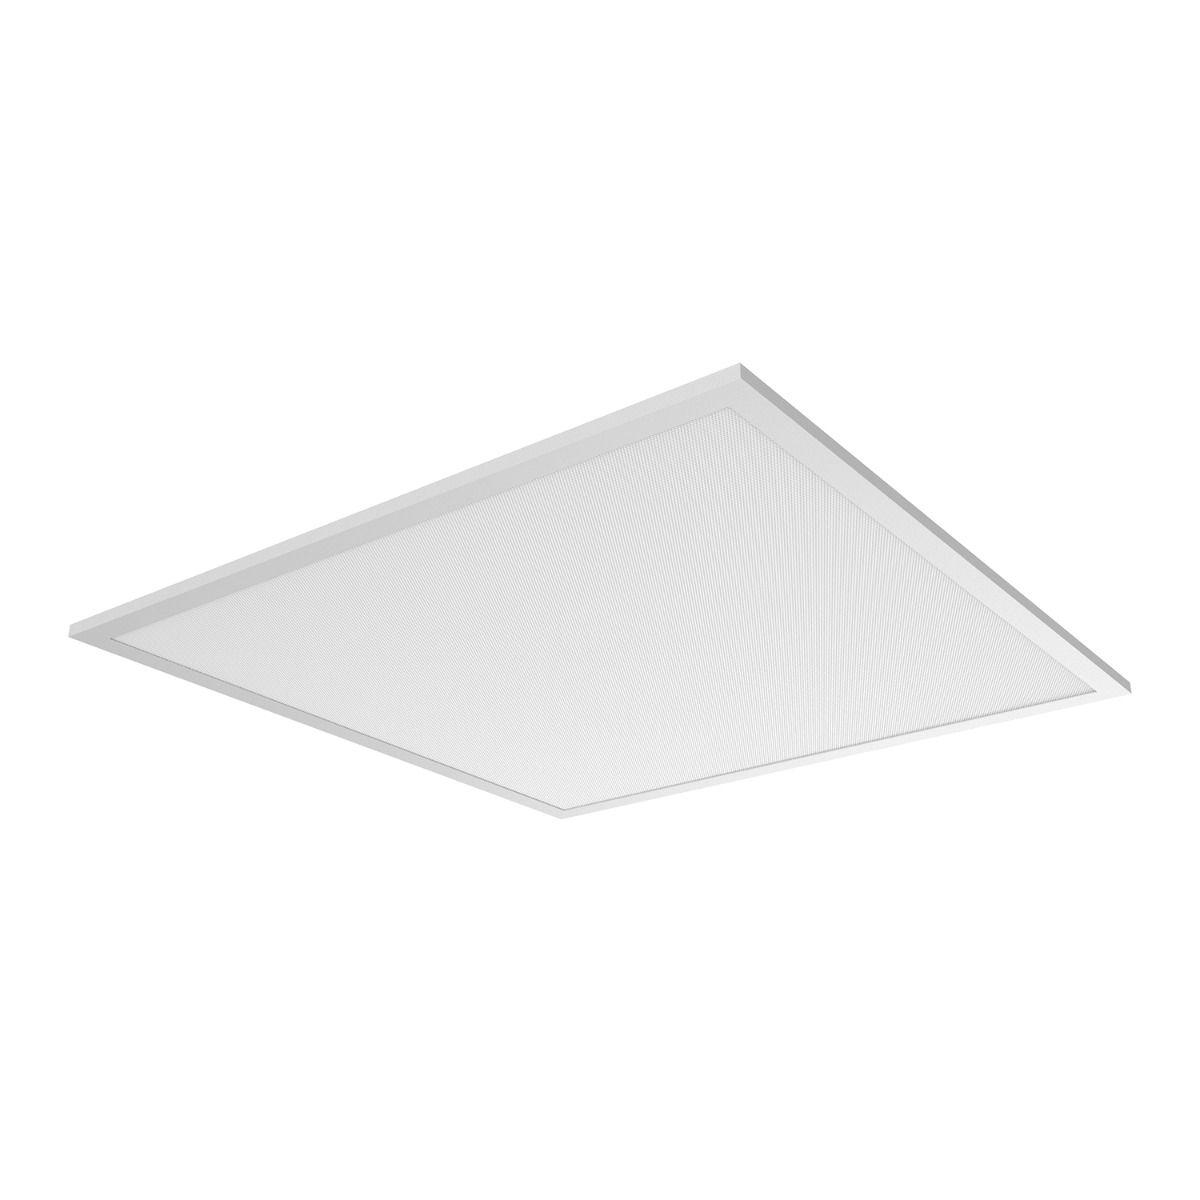 Noxion LED Panel Delta Pro V3 Highlum 36W 3000K 5225lm 60x60cm UGR <19 | Varm Vit - Ersättare 4x18W